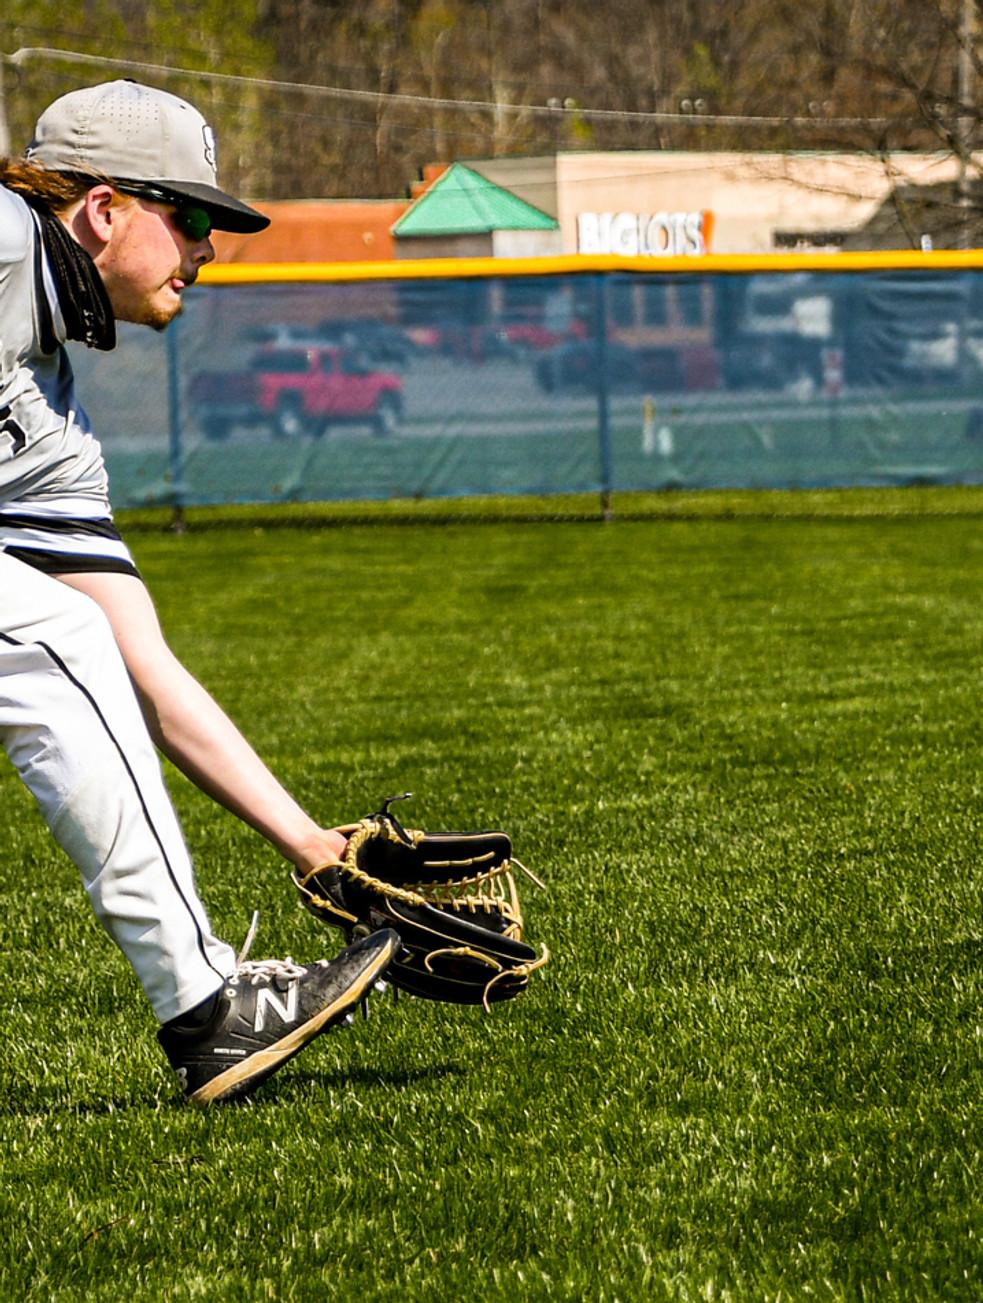 DSC_3273.jpgJeff Palicki Photography South Side Rams Baseball